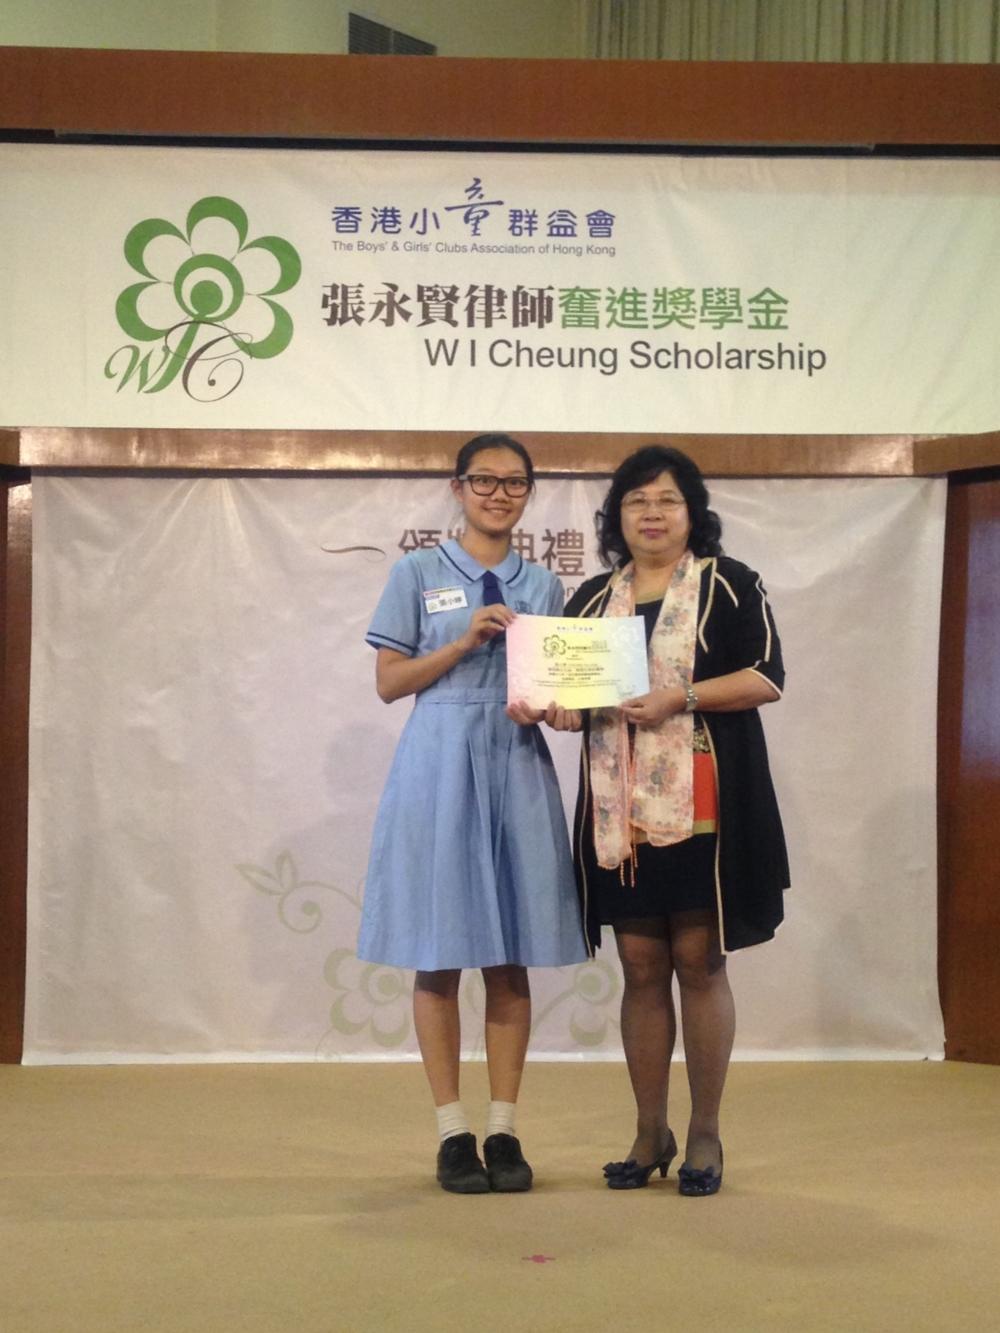 http://www.npc.edu.hk/sites/default/files/1_789.jpg